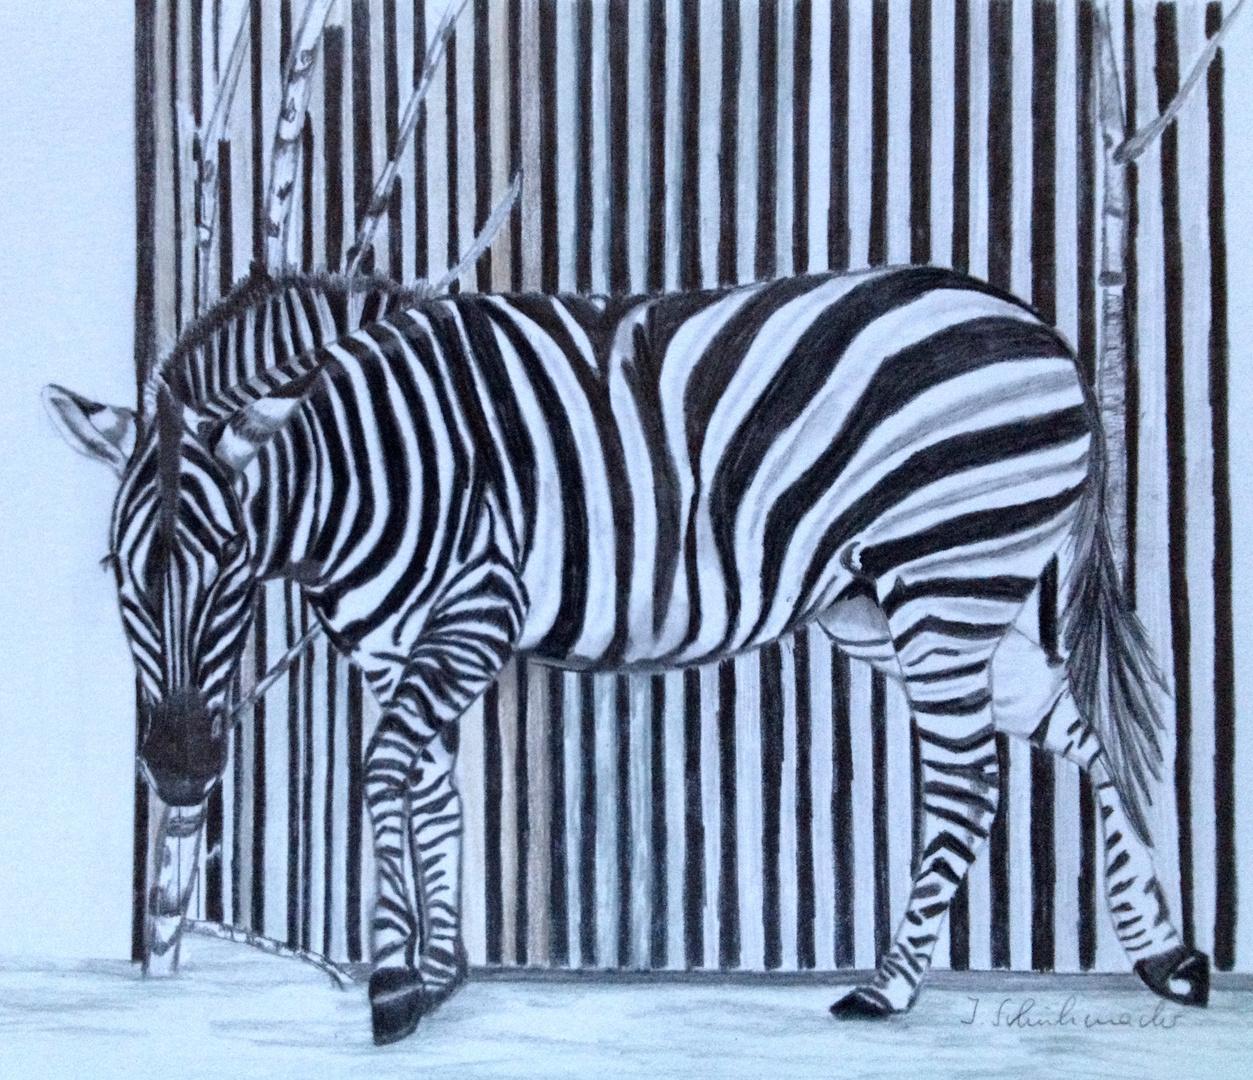 monochrom oder optische t uschung foto bild kunstfotografie kultur gem lde skulpturen. Black Bedroom Furniture Sets. Home Design Ideas